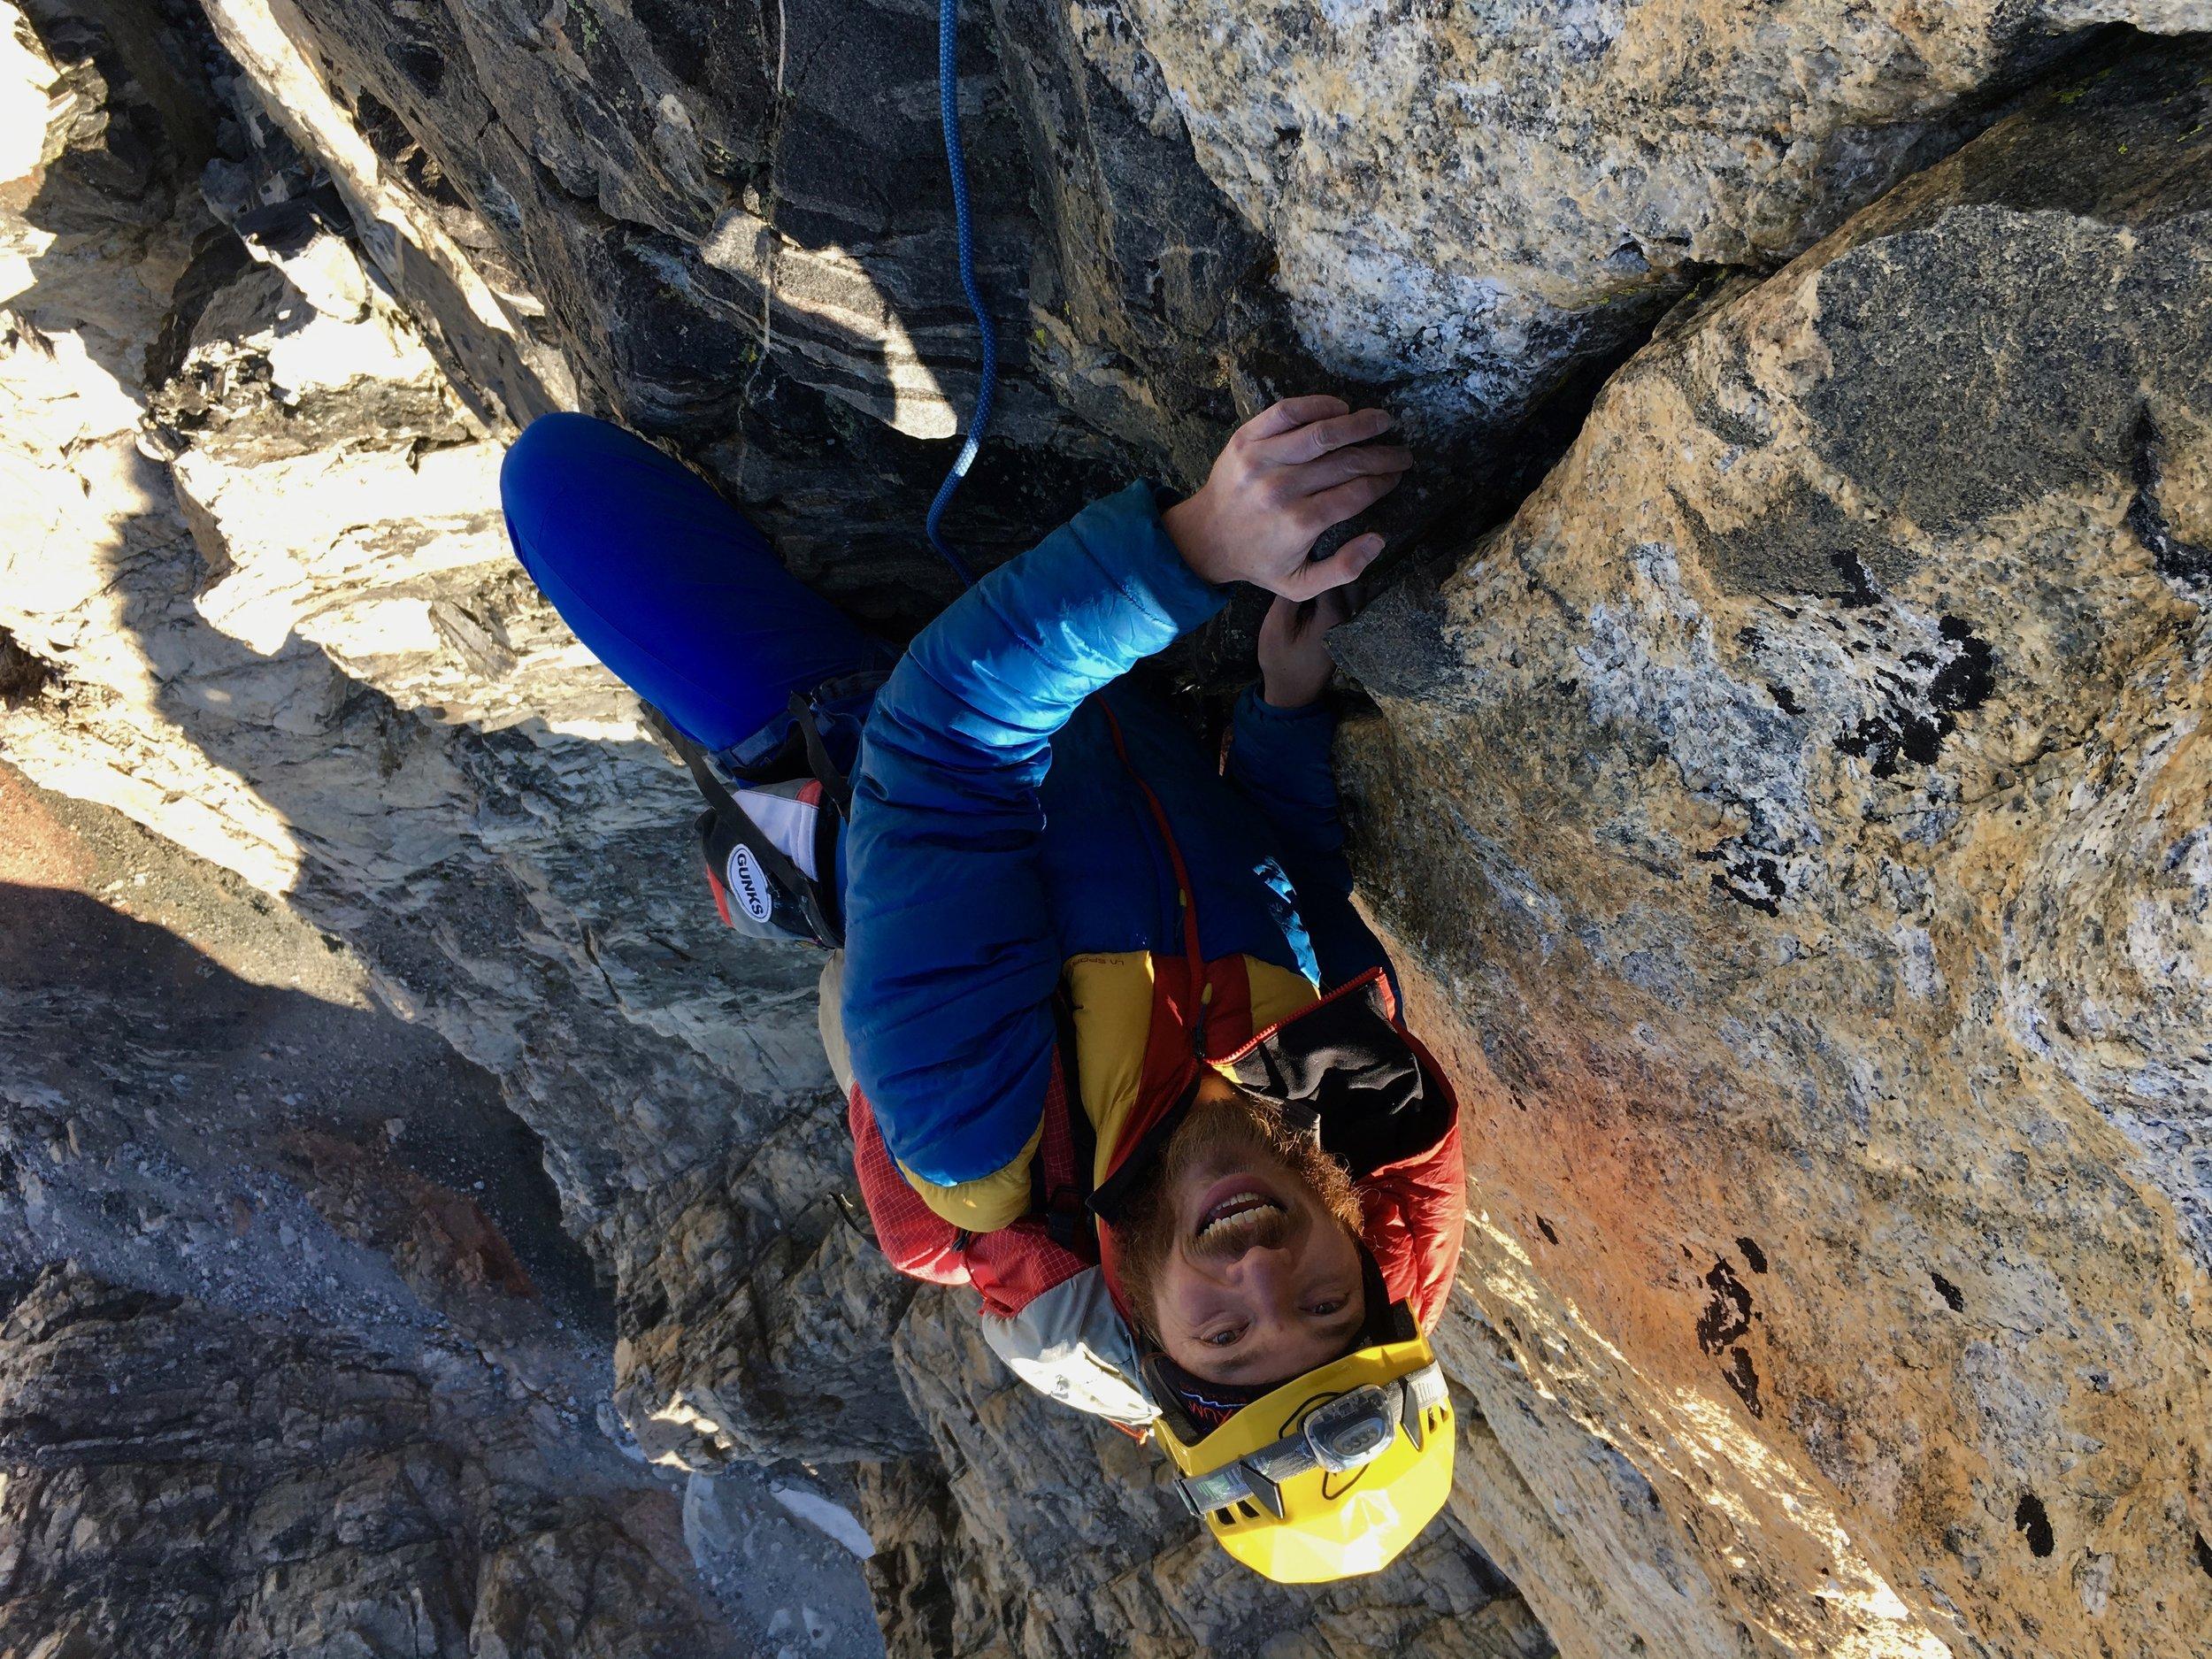 Steep climbing on the Lower Exum!